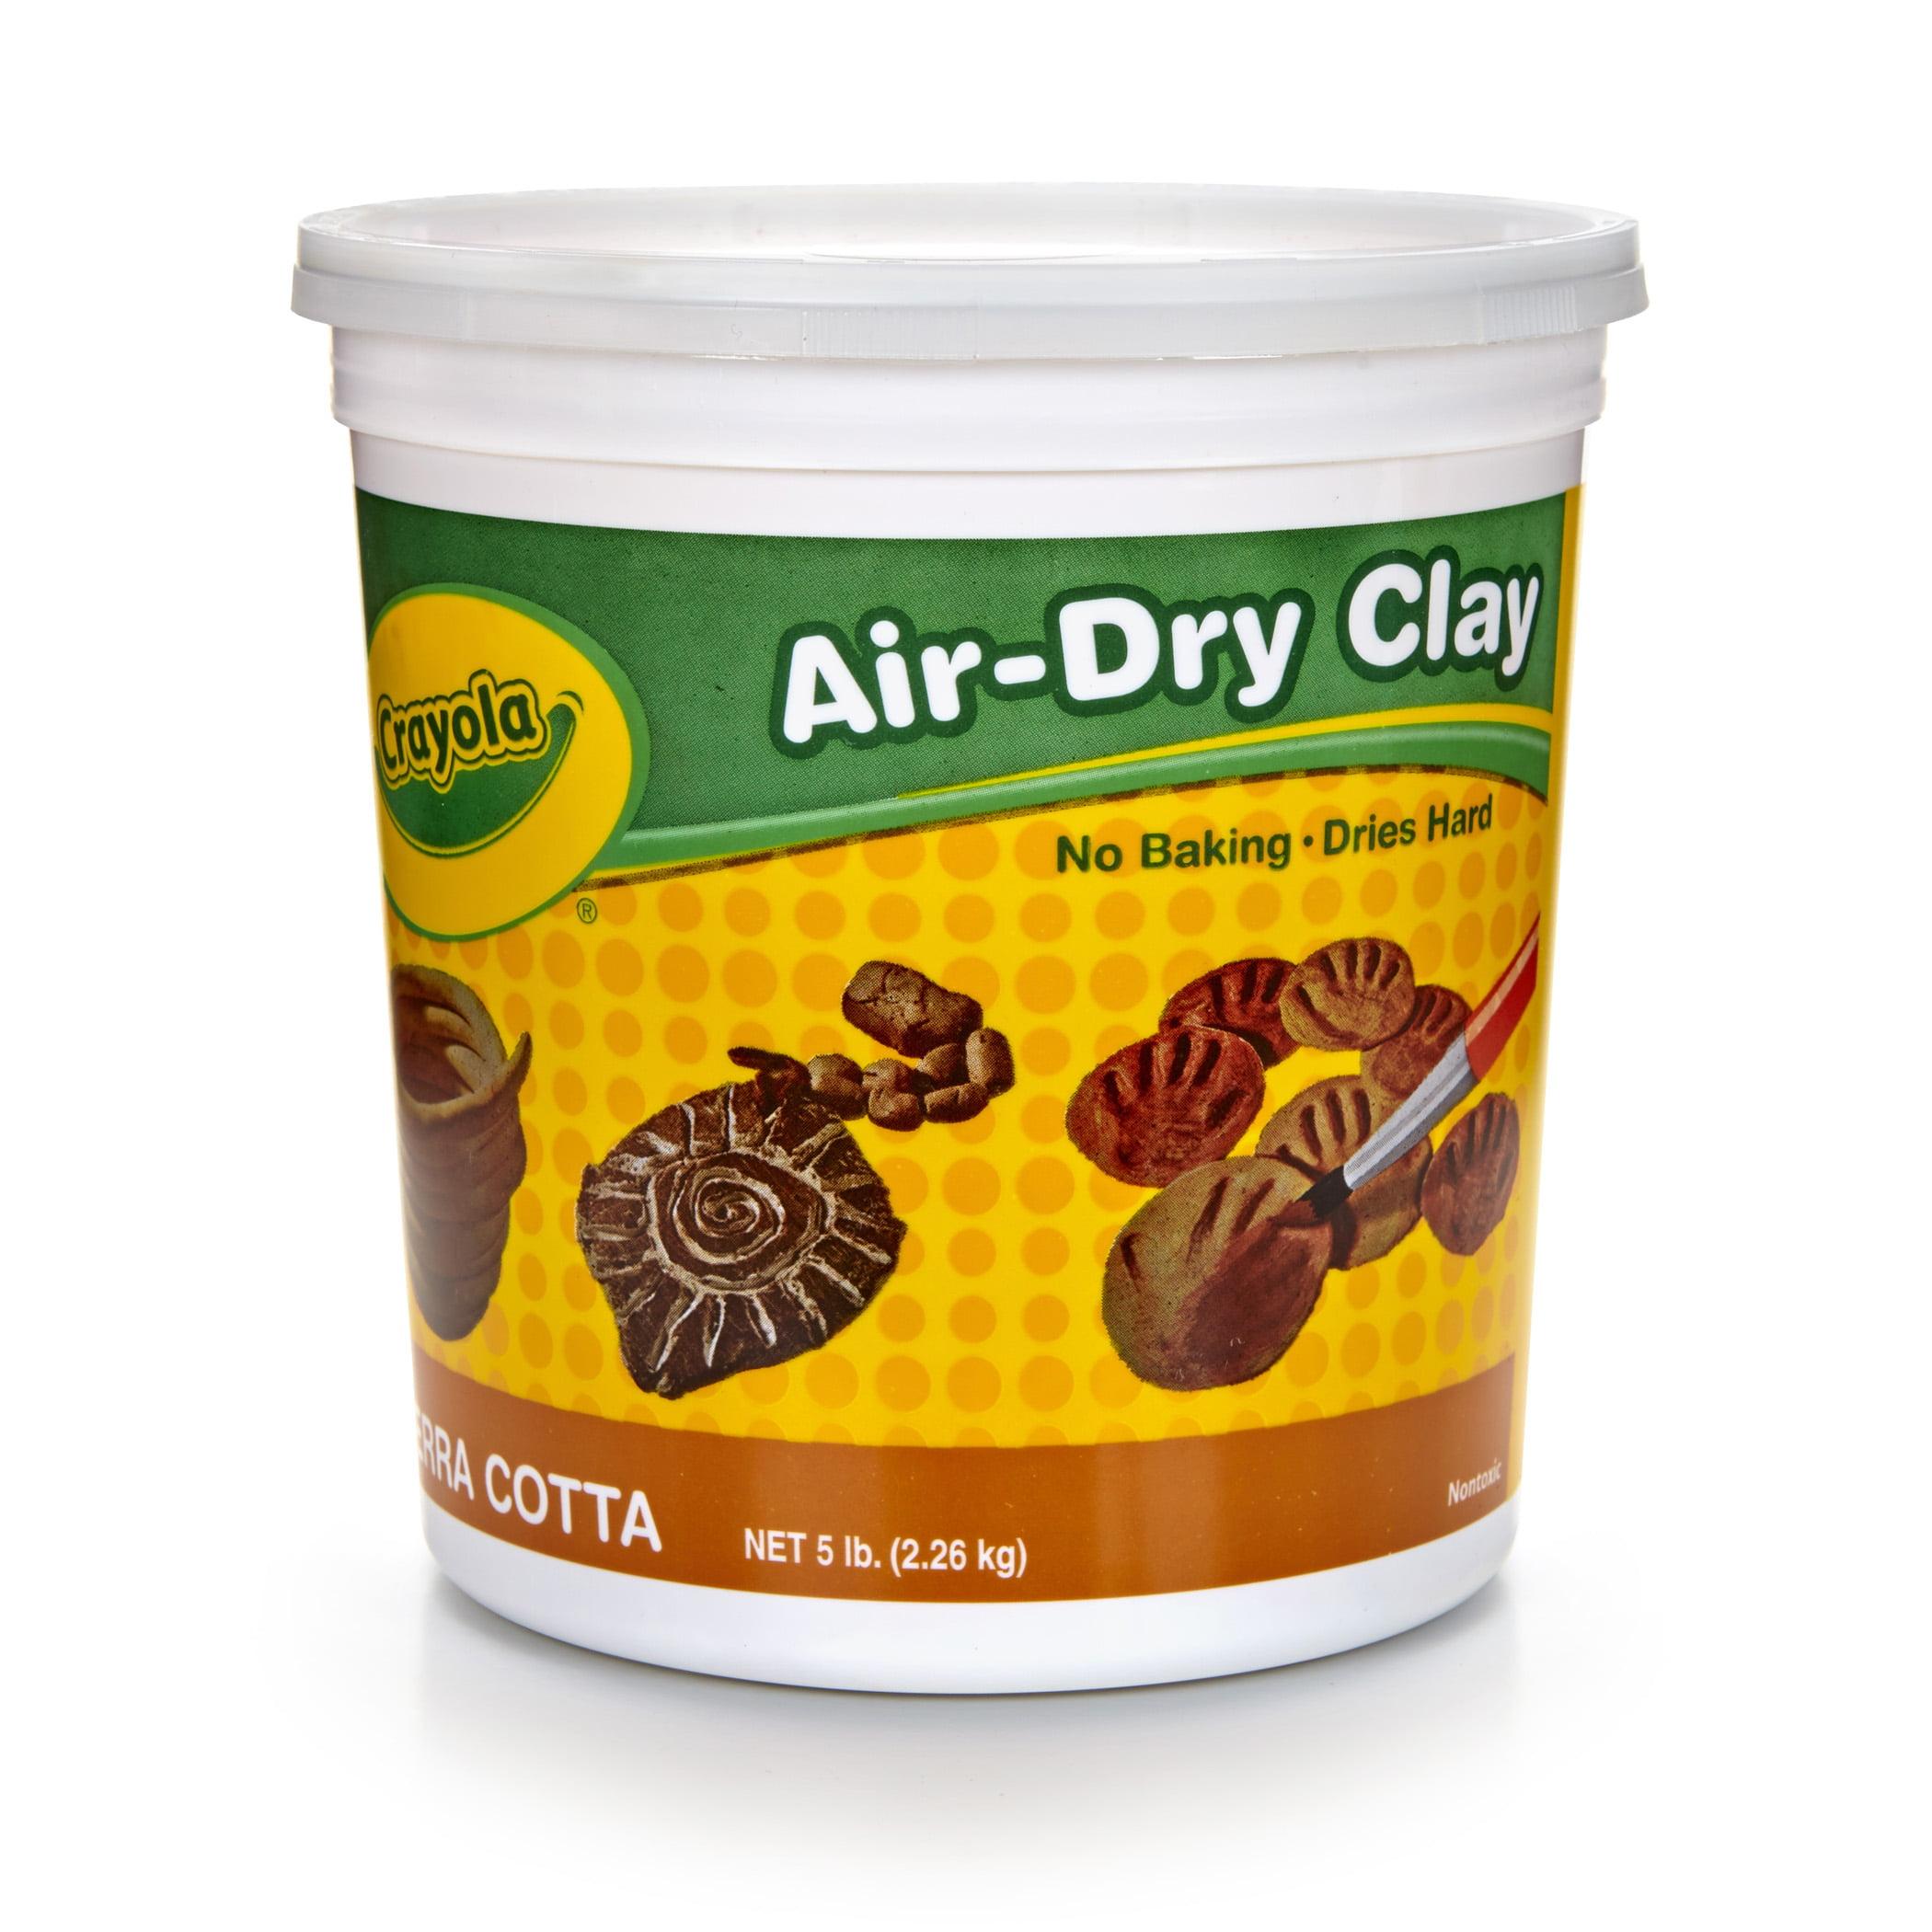 Crayola Air-Dry Clay, 5 Lb Tub, Terra Cotta